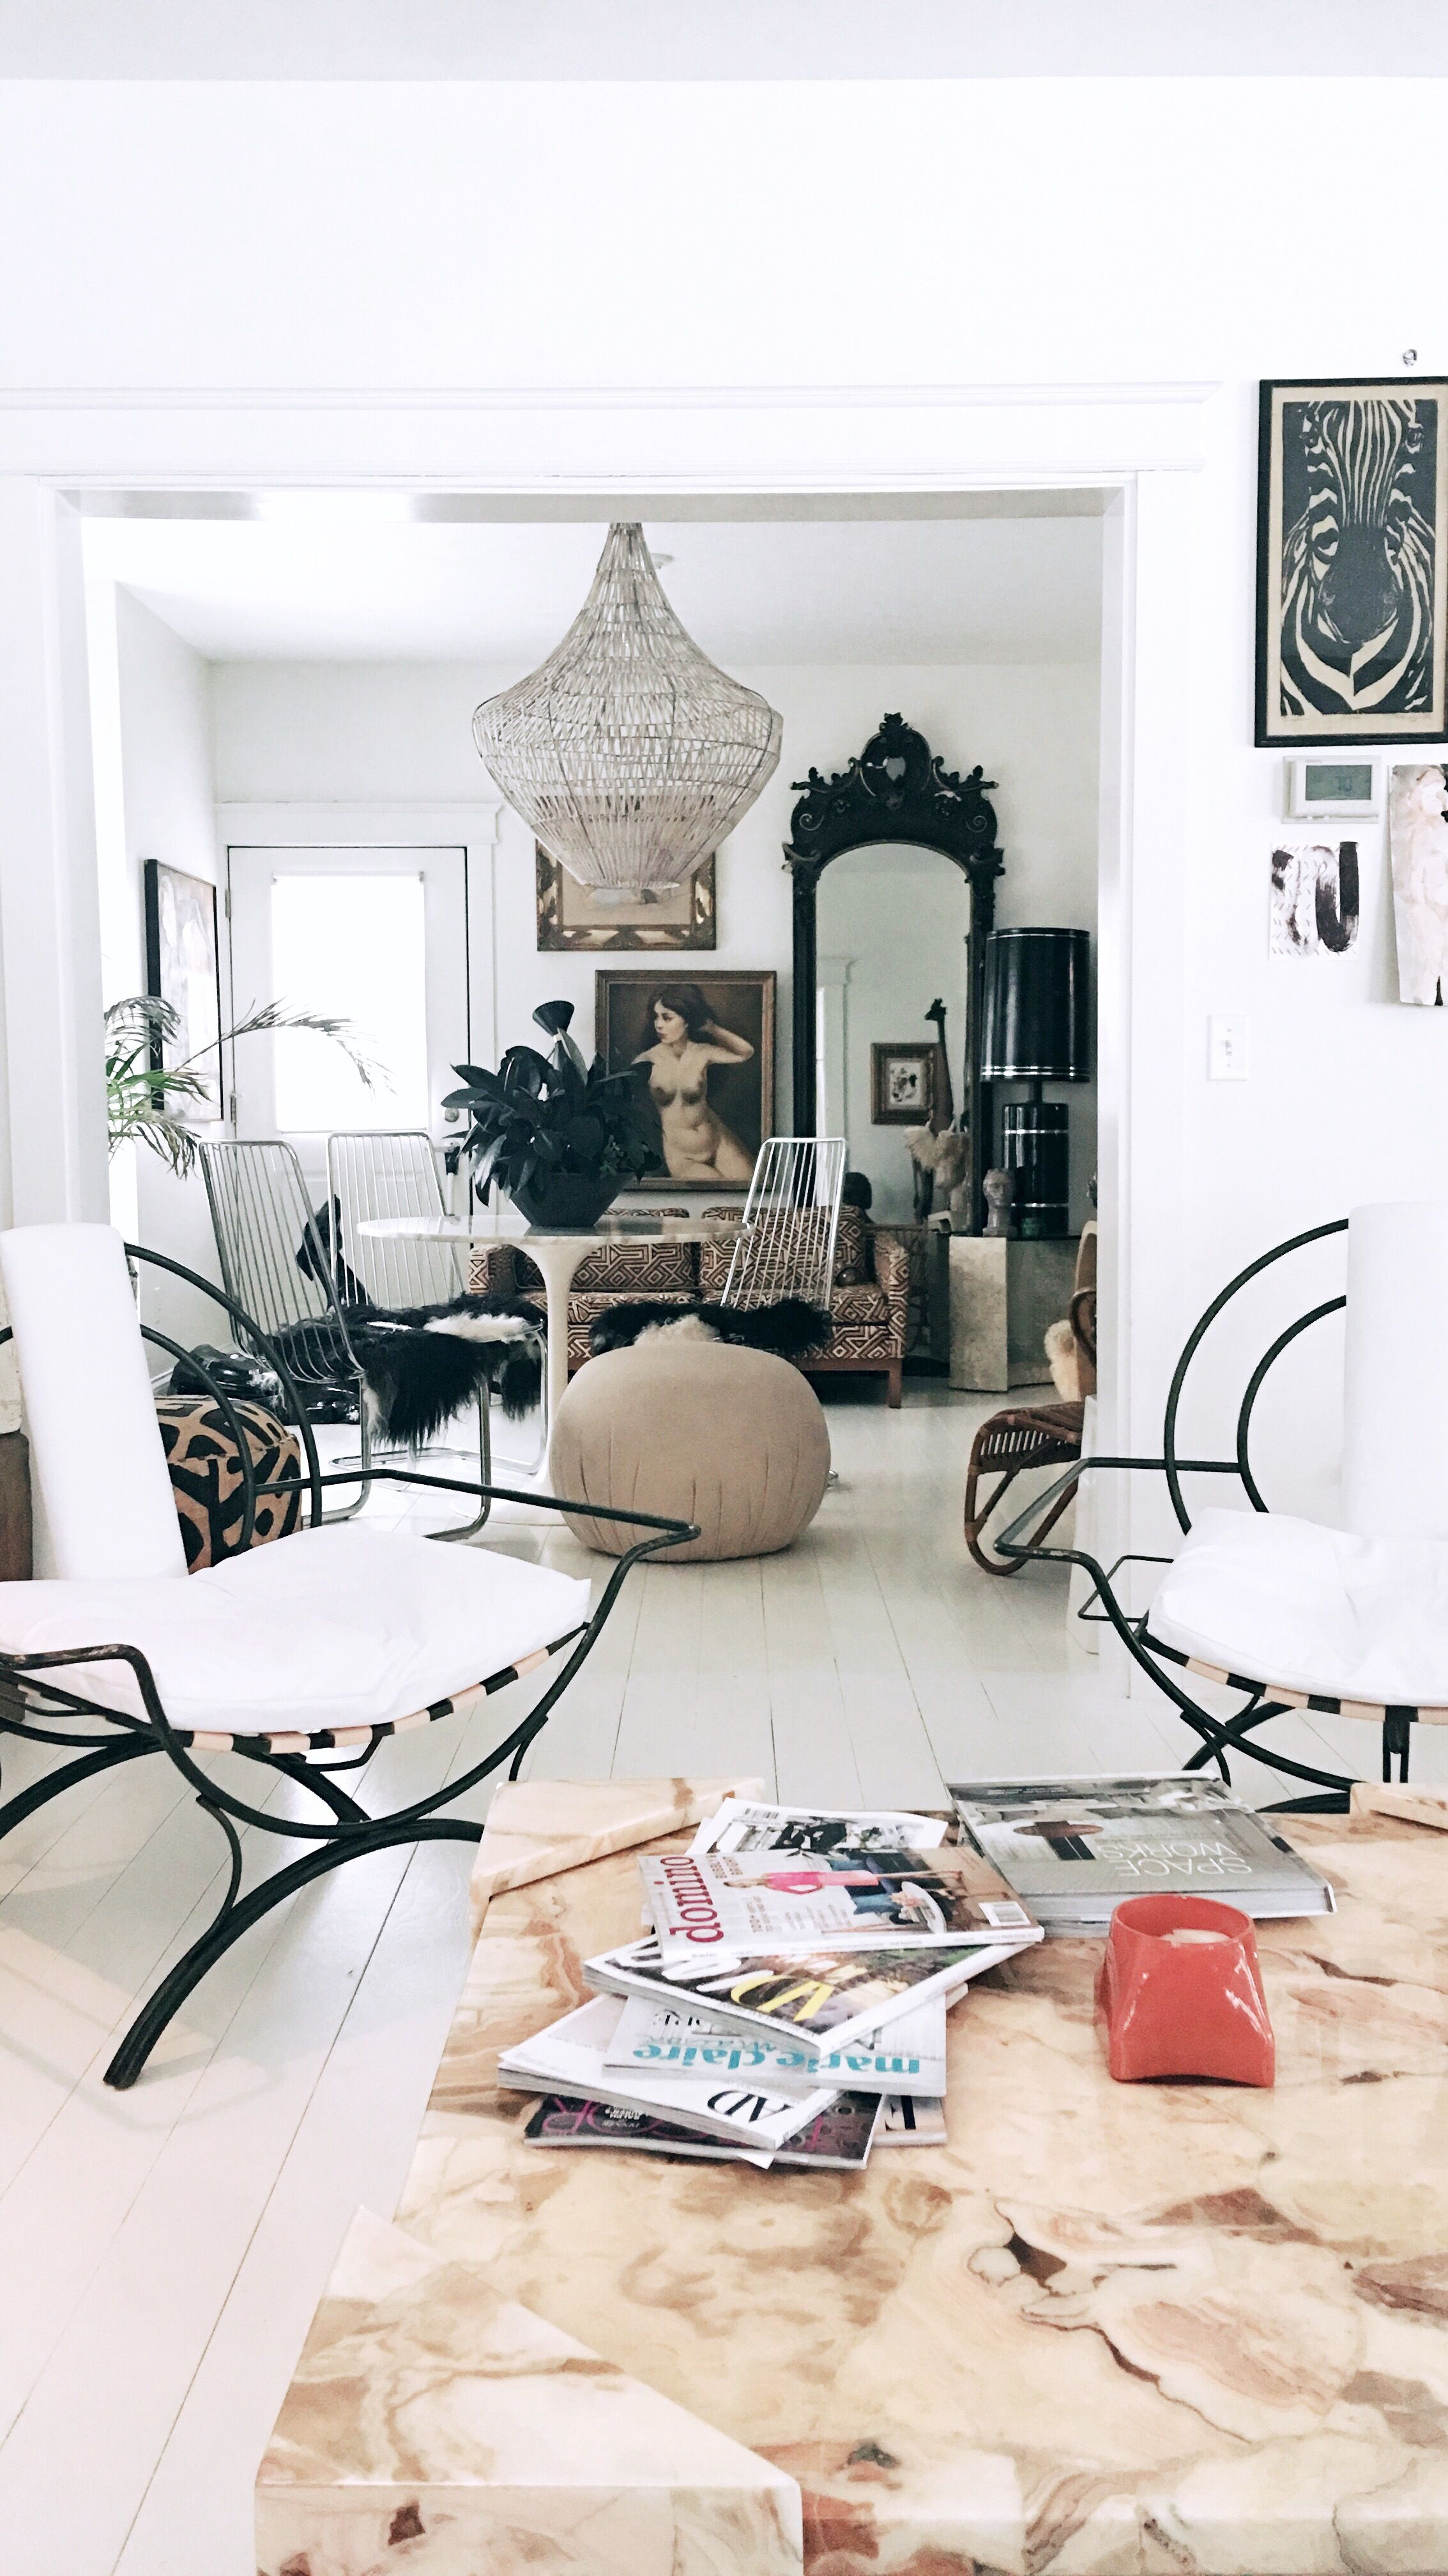 Fleamarketfab home / interiors | Home, Decor & Interiors | Pinterest ...